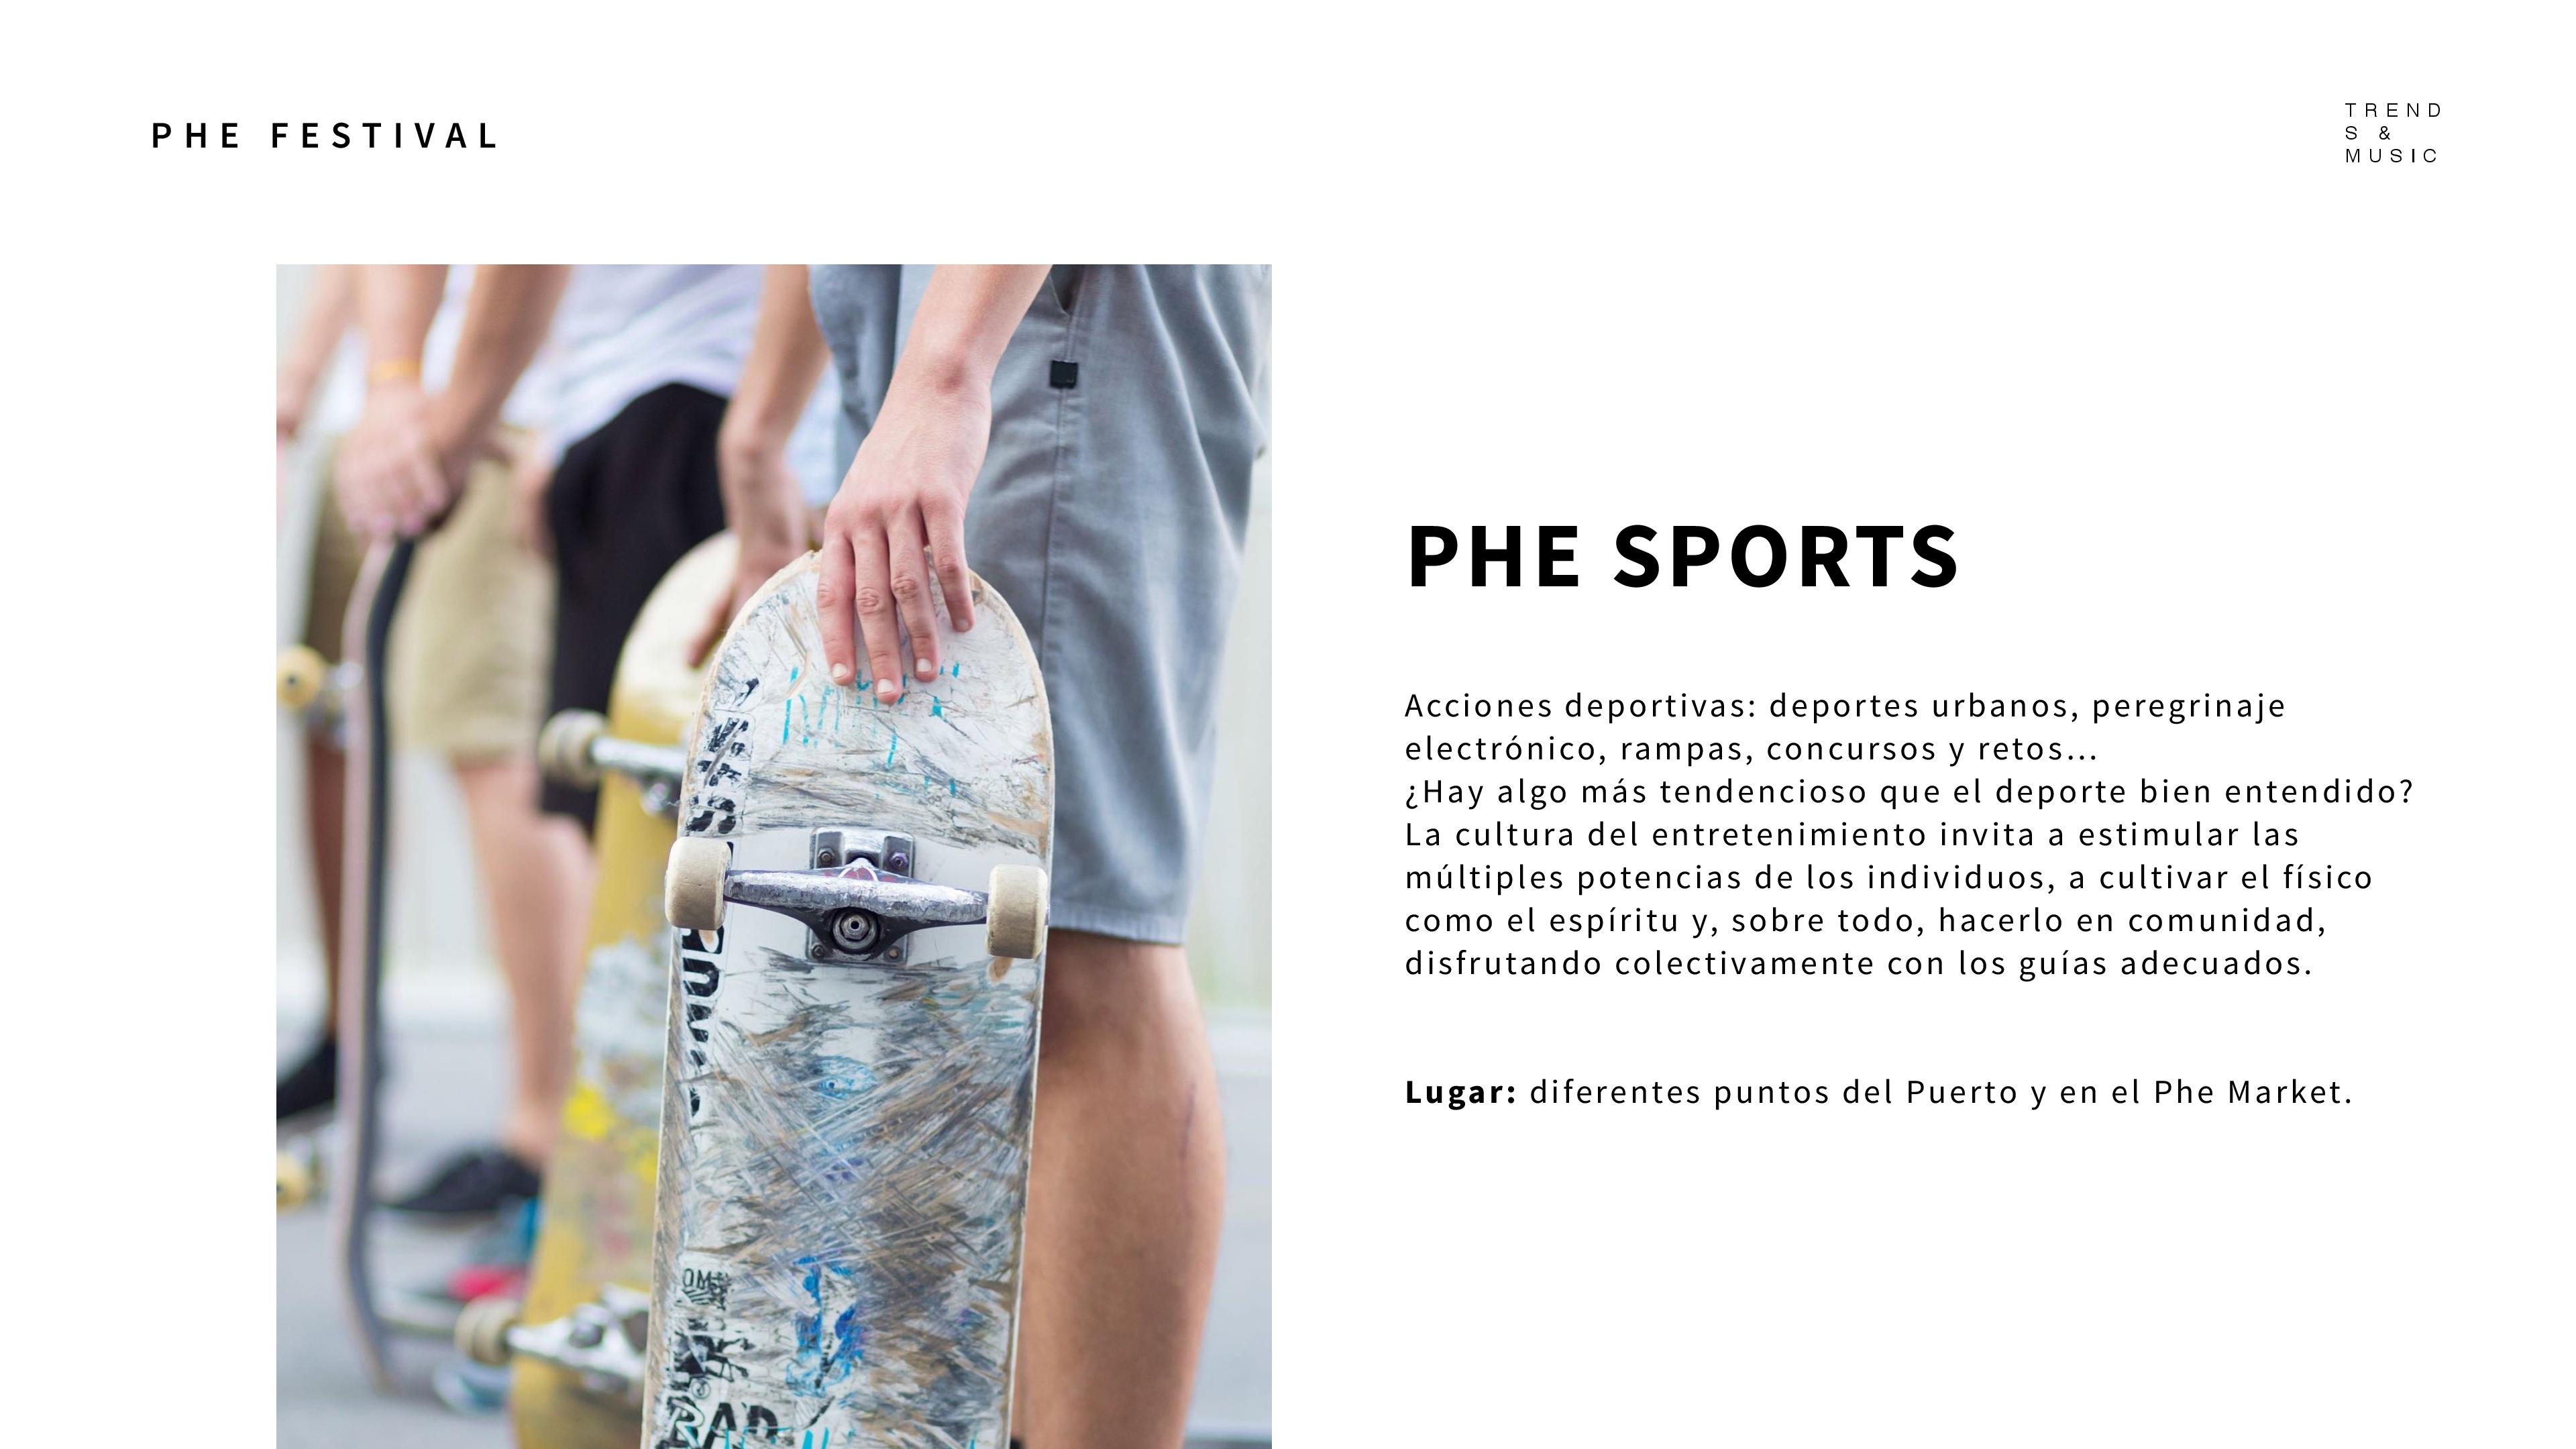 Dossier-de-Prensa---Phe-Festival-2017-013